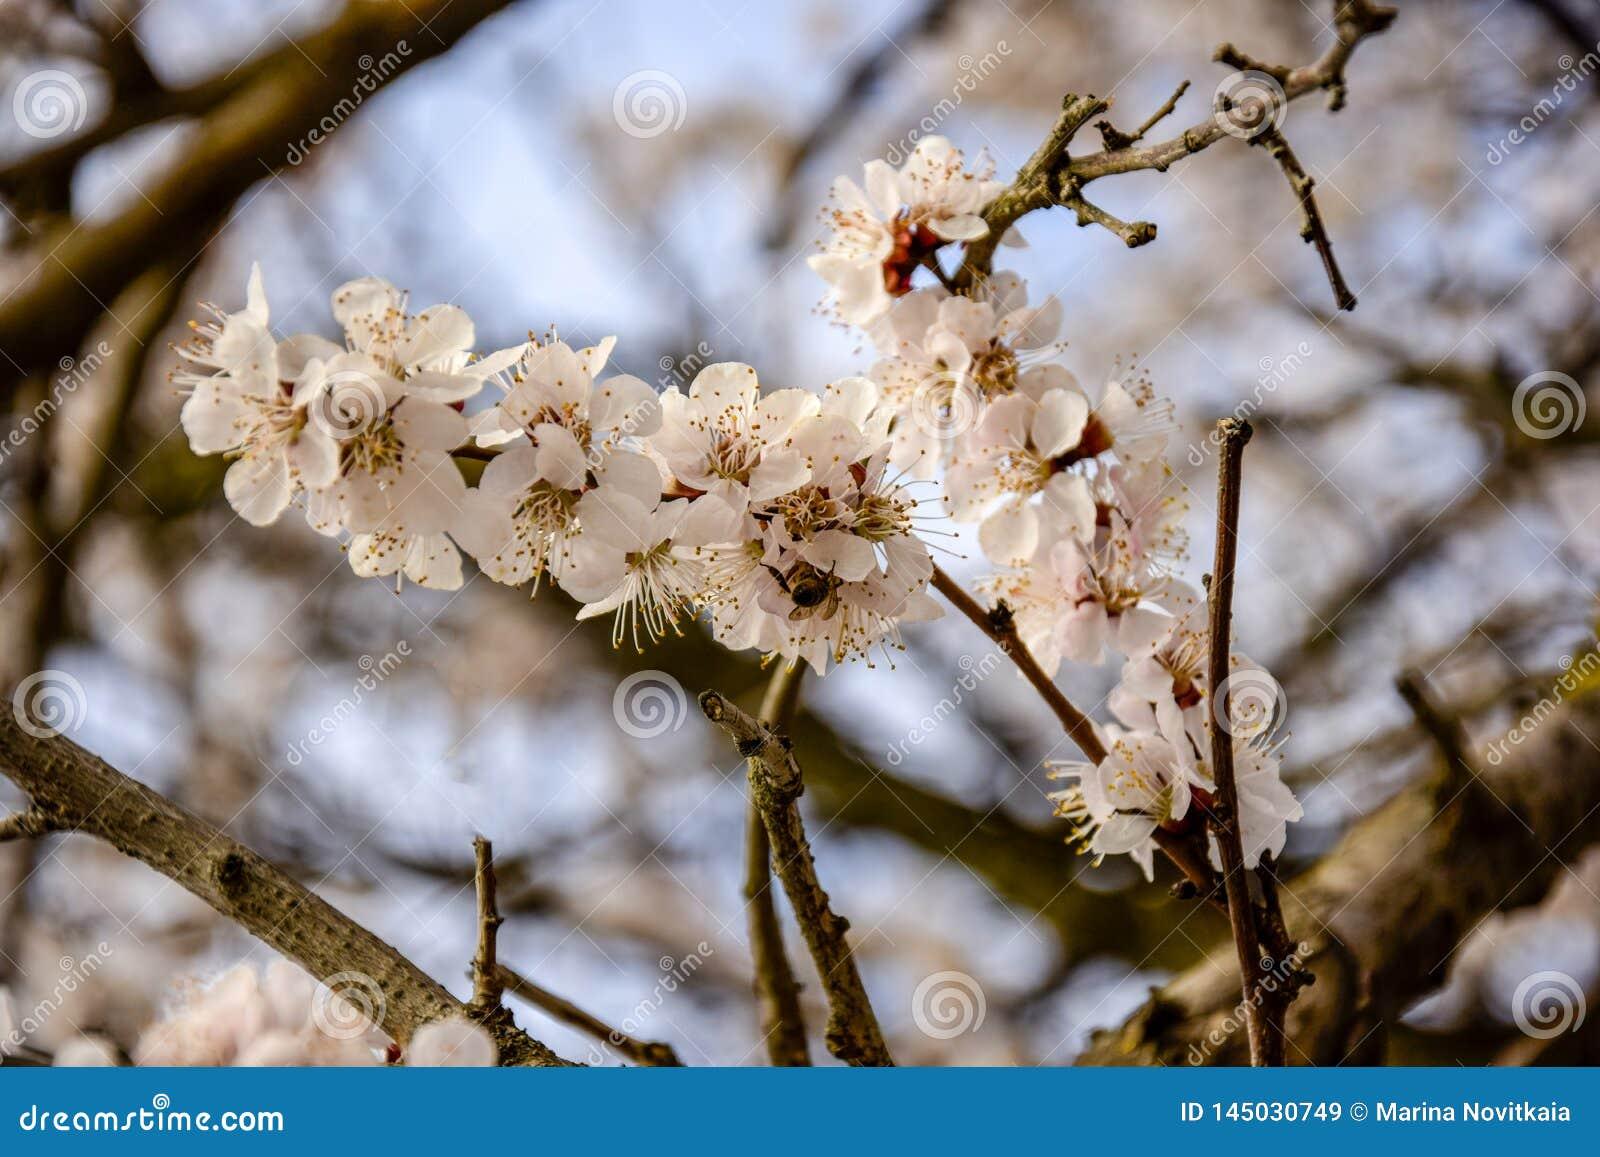 Abstrakcjonistyczni Naturalni t?a Z okwitni?cie moreli Delikatnymi kwiatami